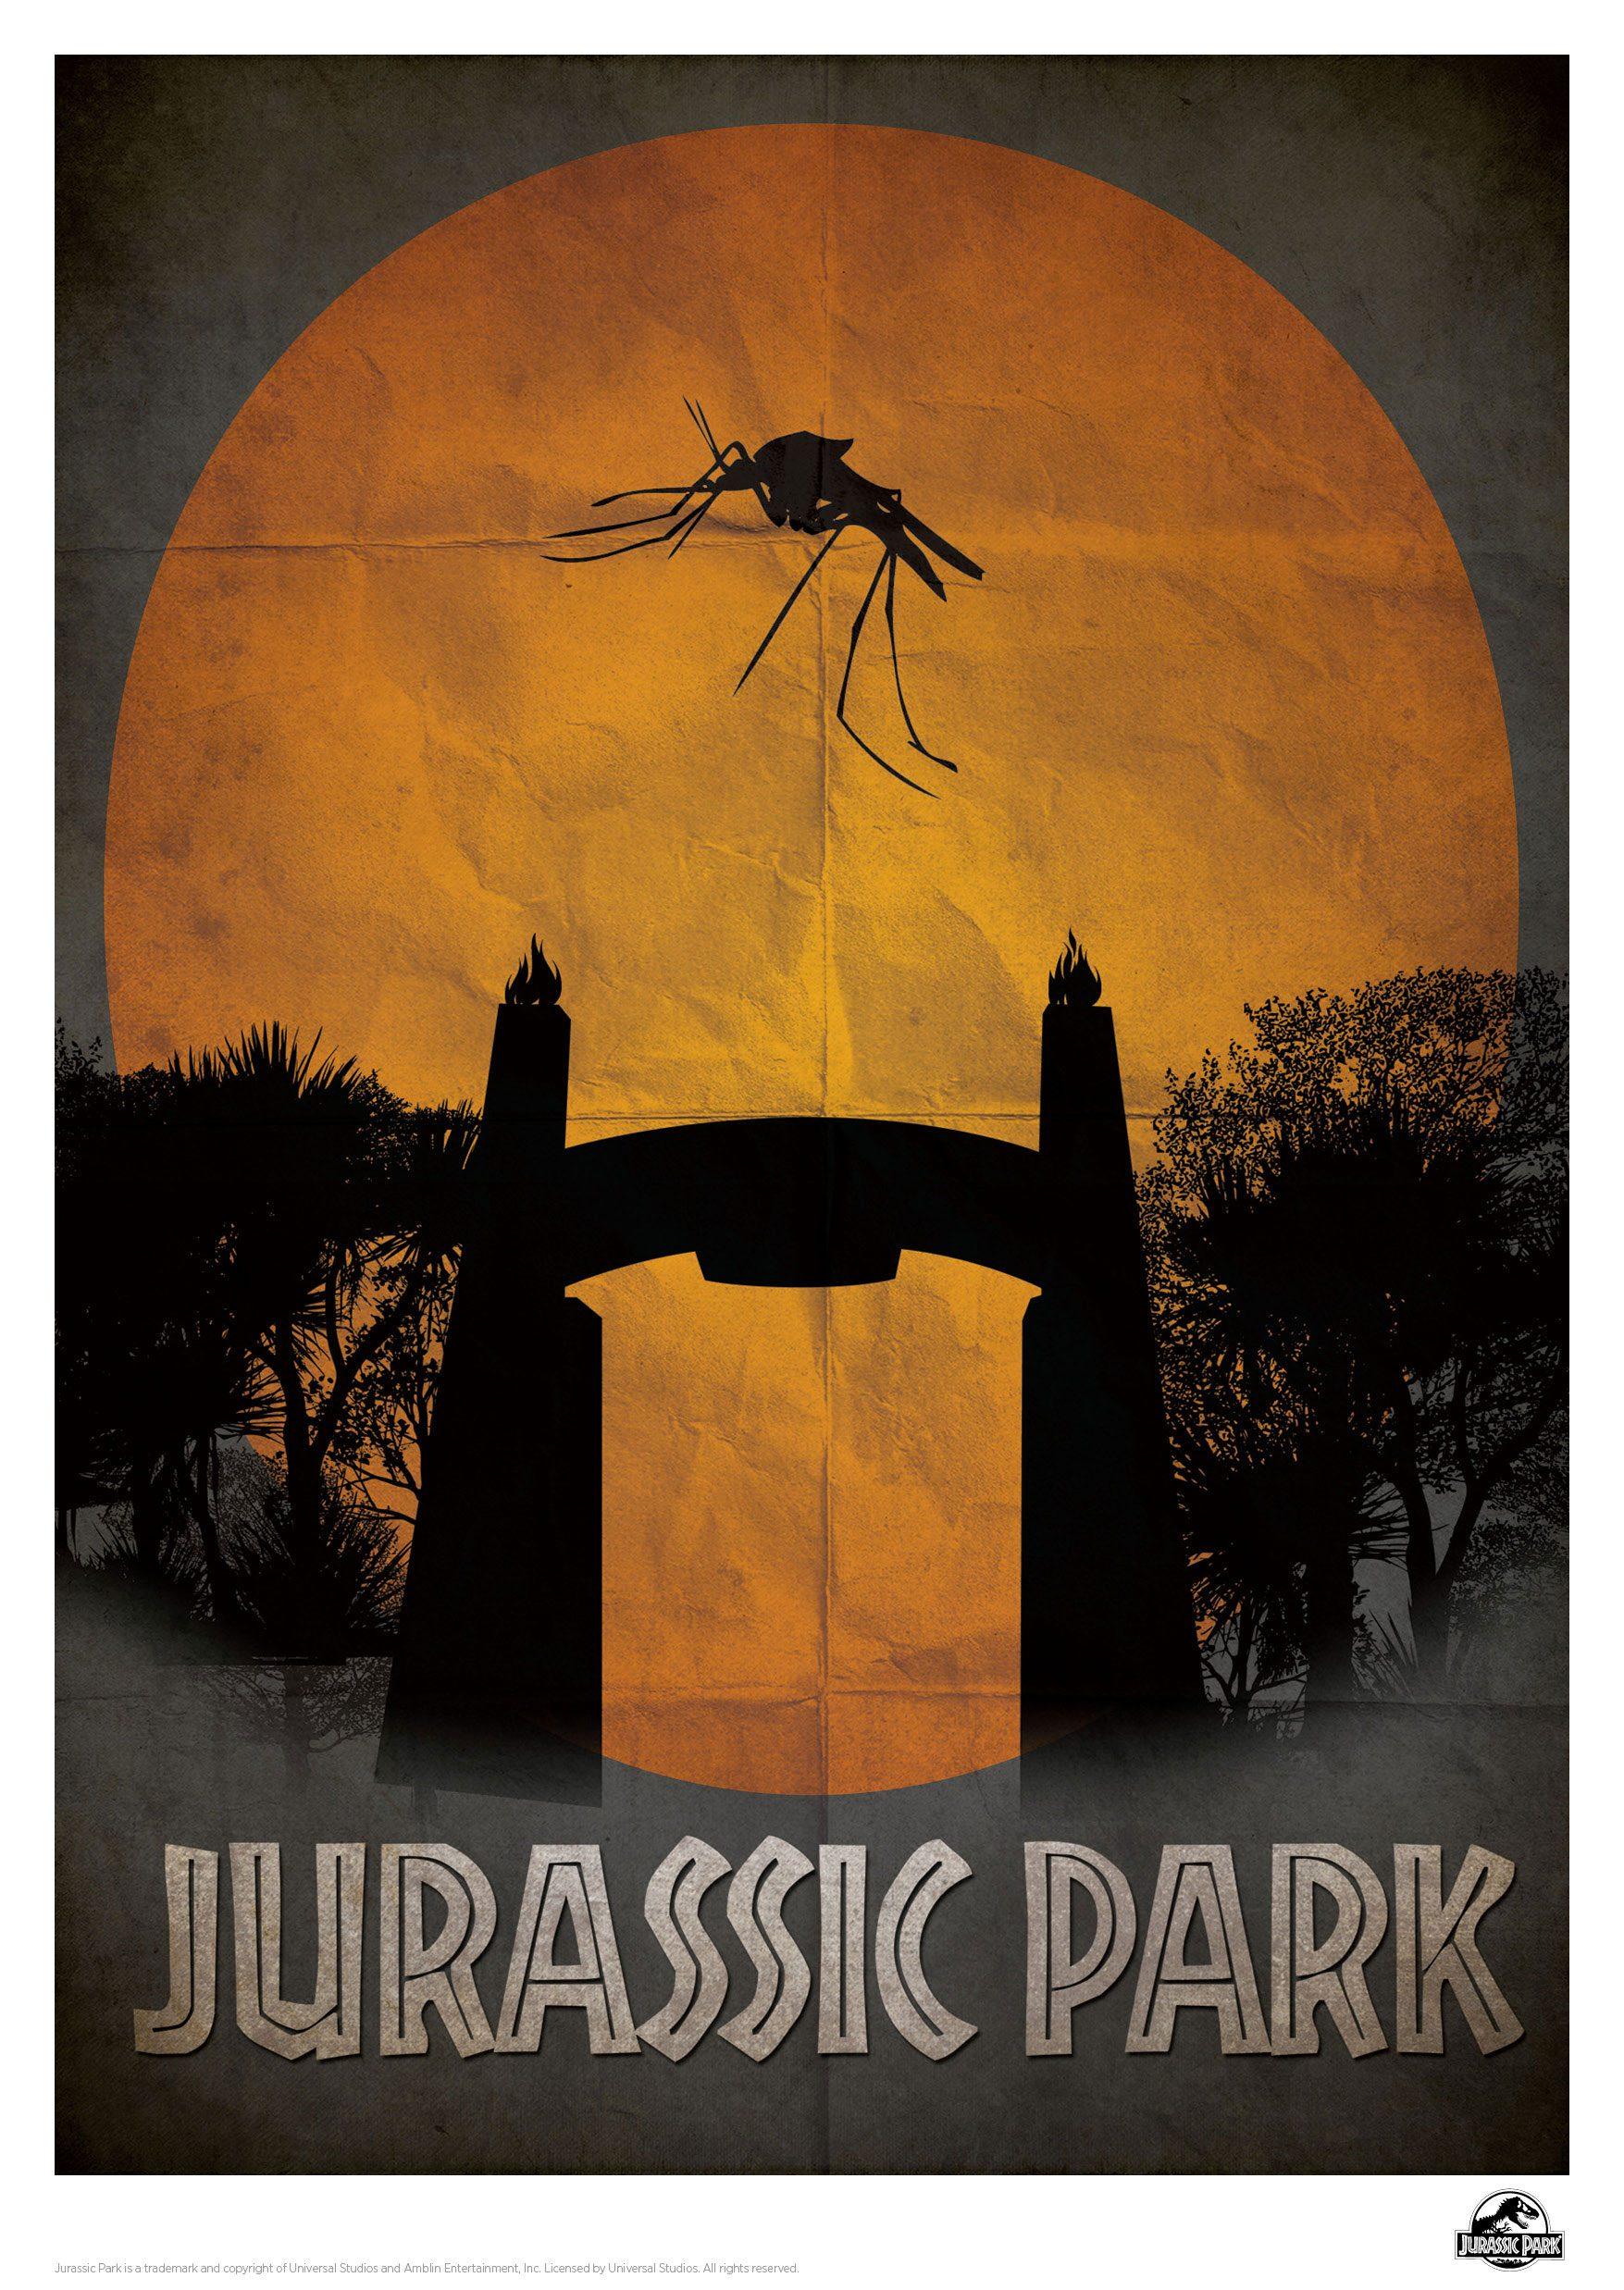 Jurassic Park Art Print Gate 42 x 30 cm